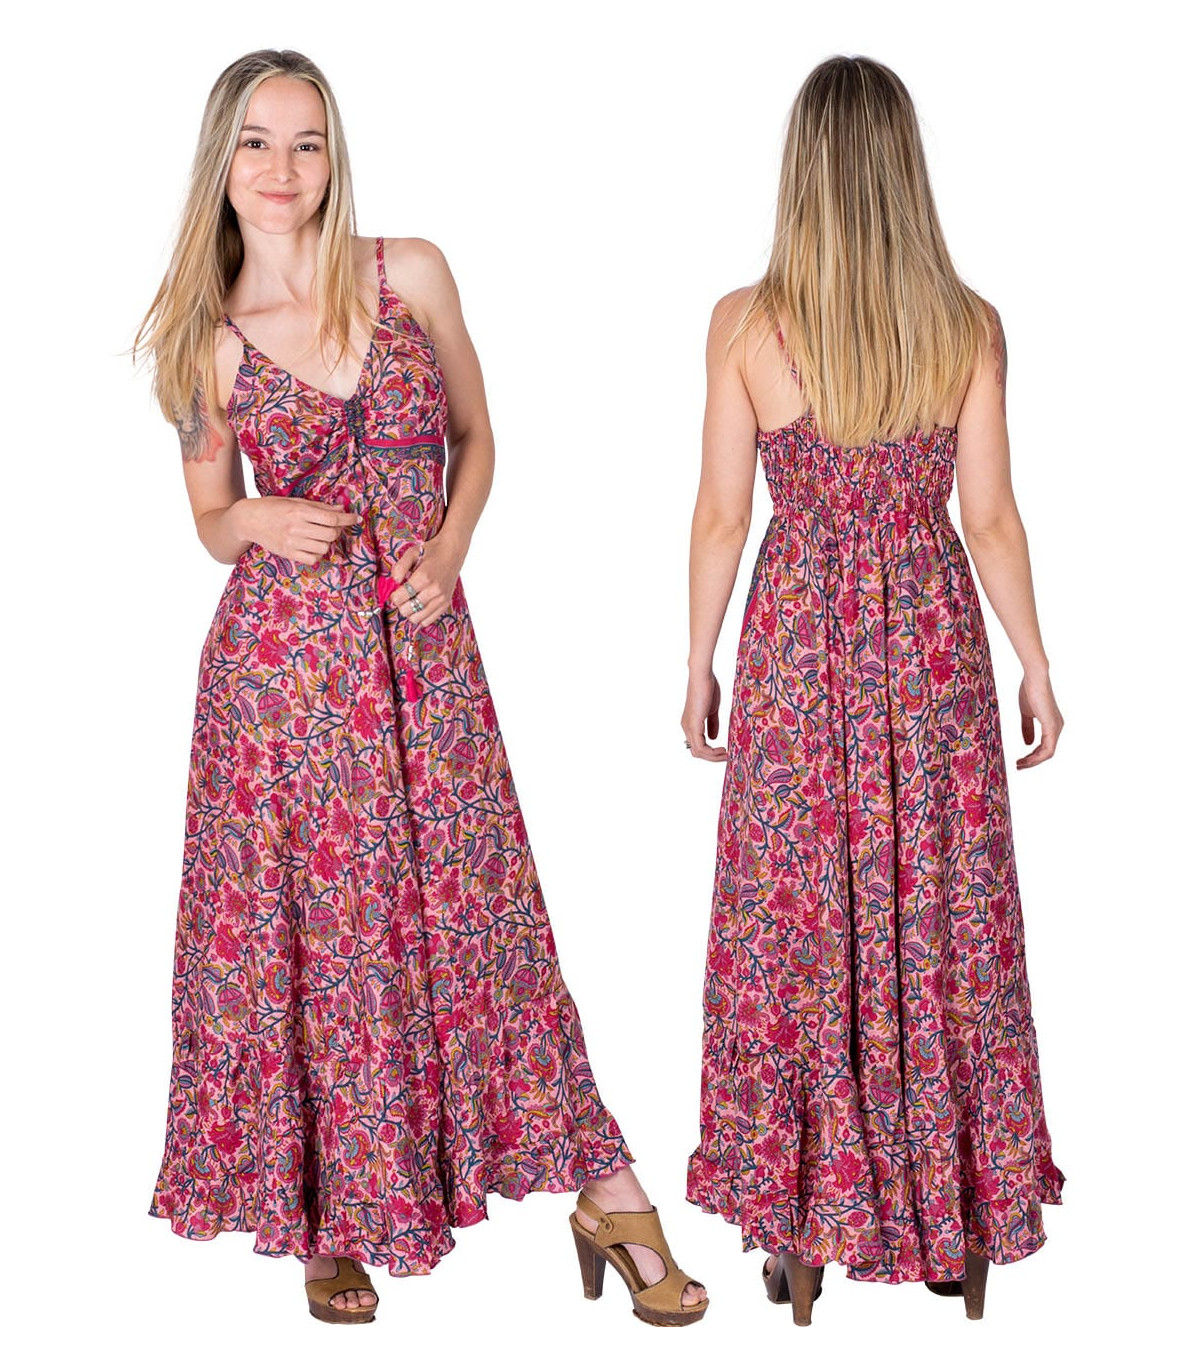 Bohemian style maxi dress | Ethnic print dress